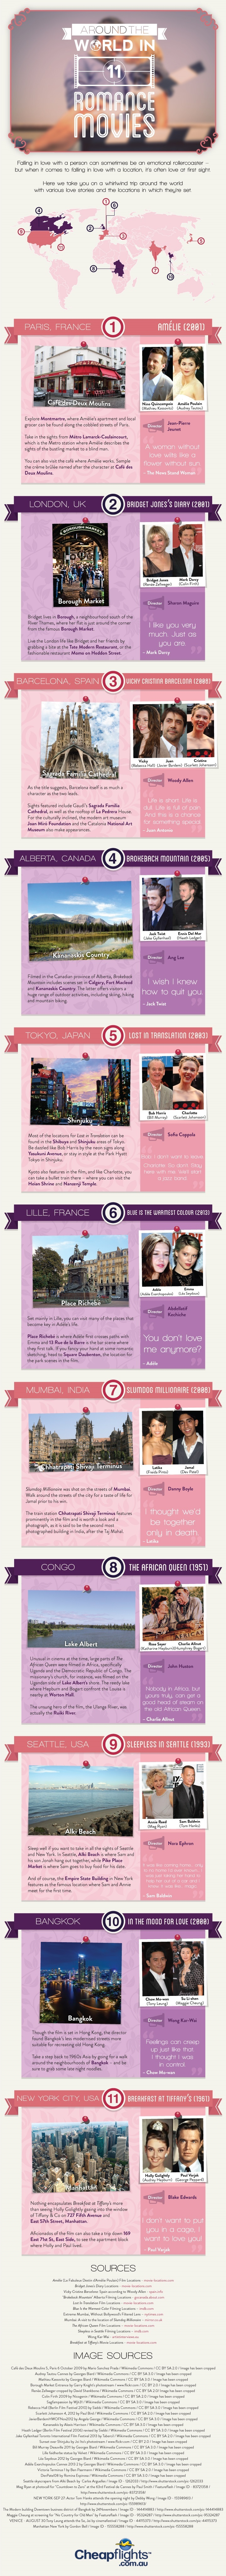 Around the World in 11 Romance Movies